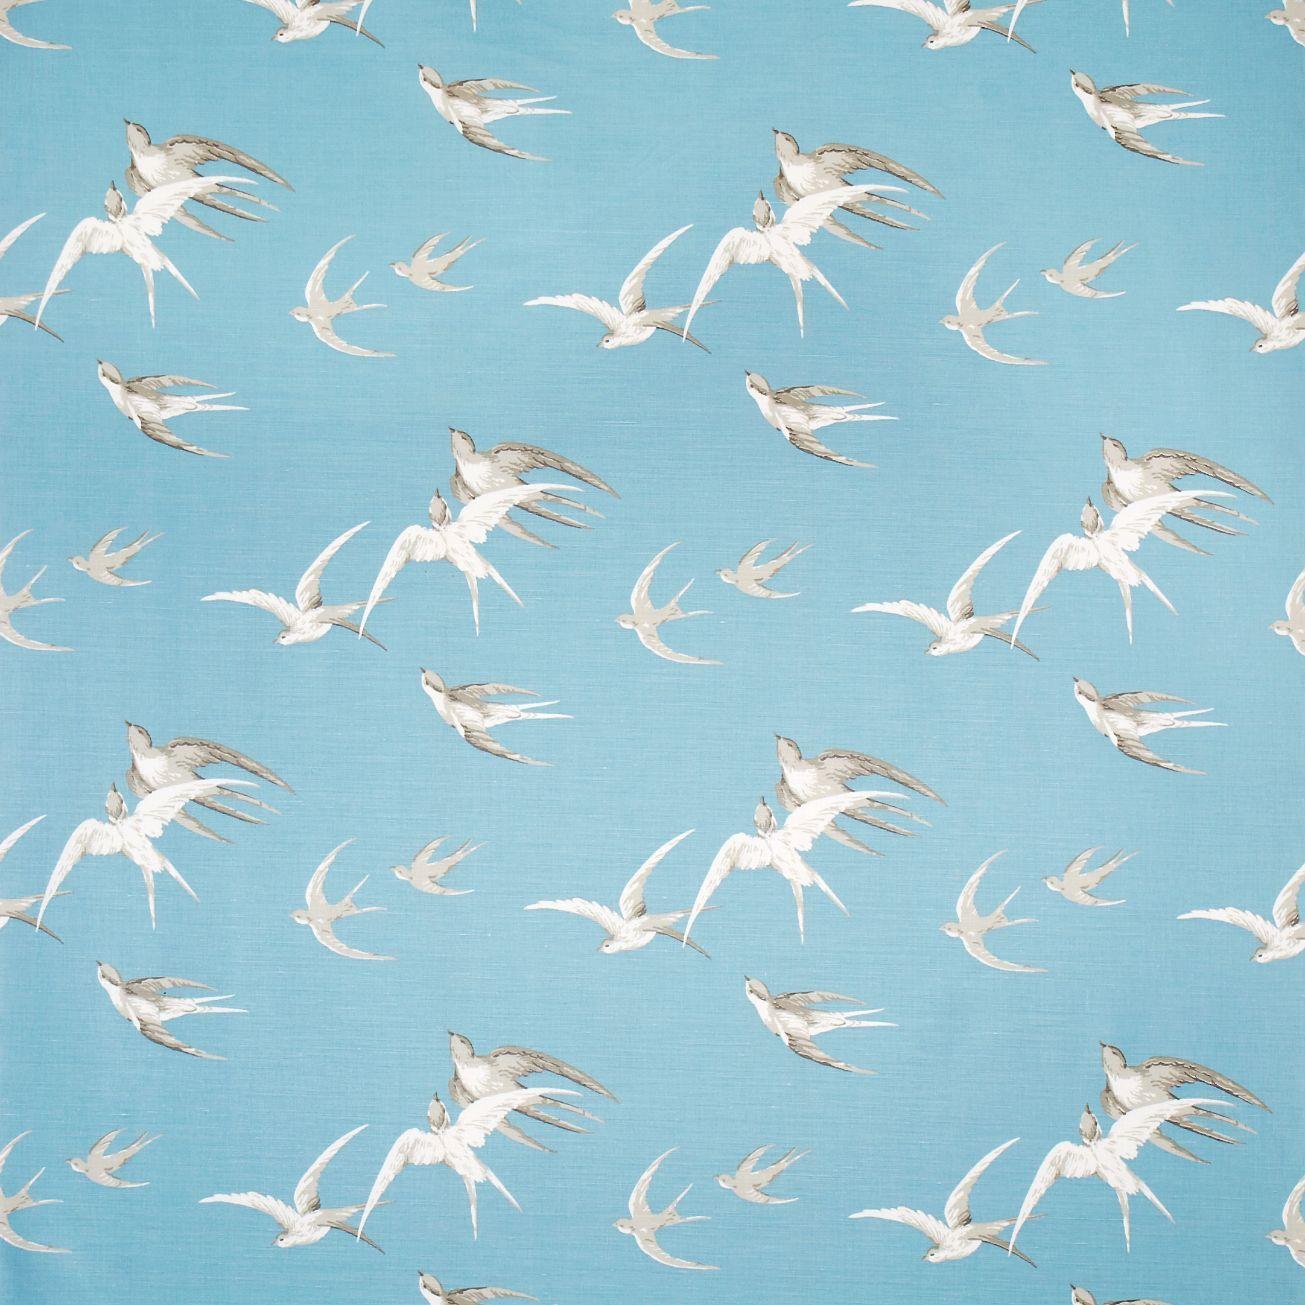 Sanderson swallows pattern originally from the 1930 39 s - Sanderson swallows wallpaper pebble ...